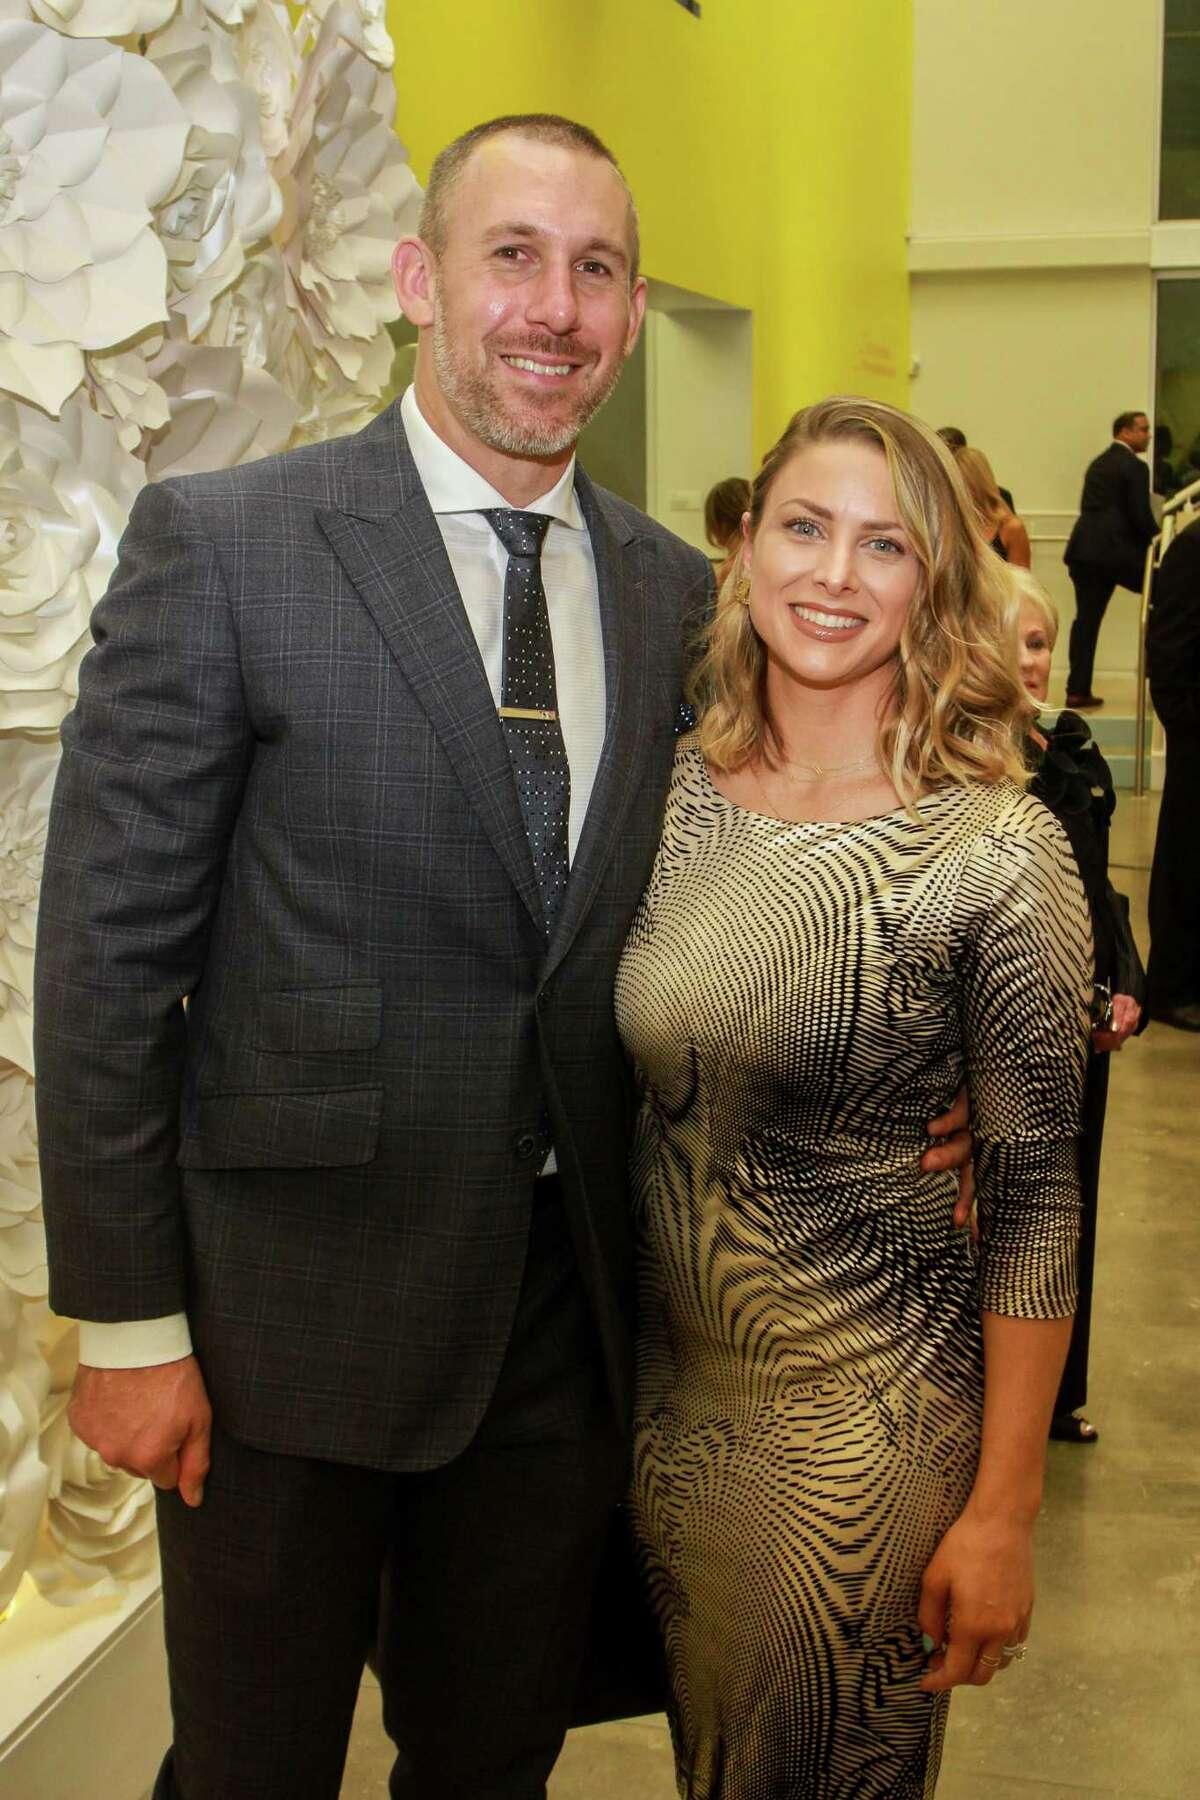 Angela and Owen Daniels at the Homemade Hope gala.